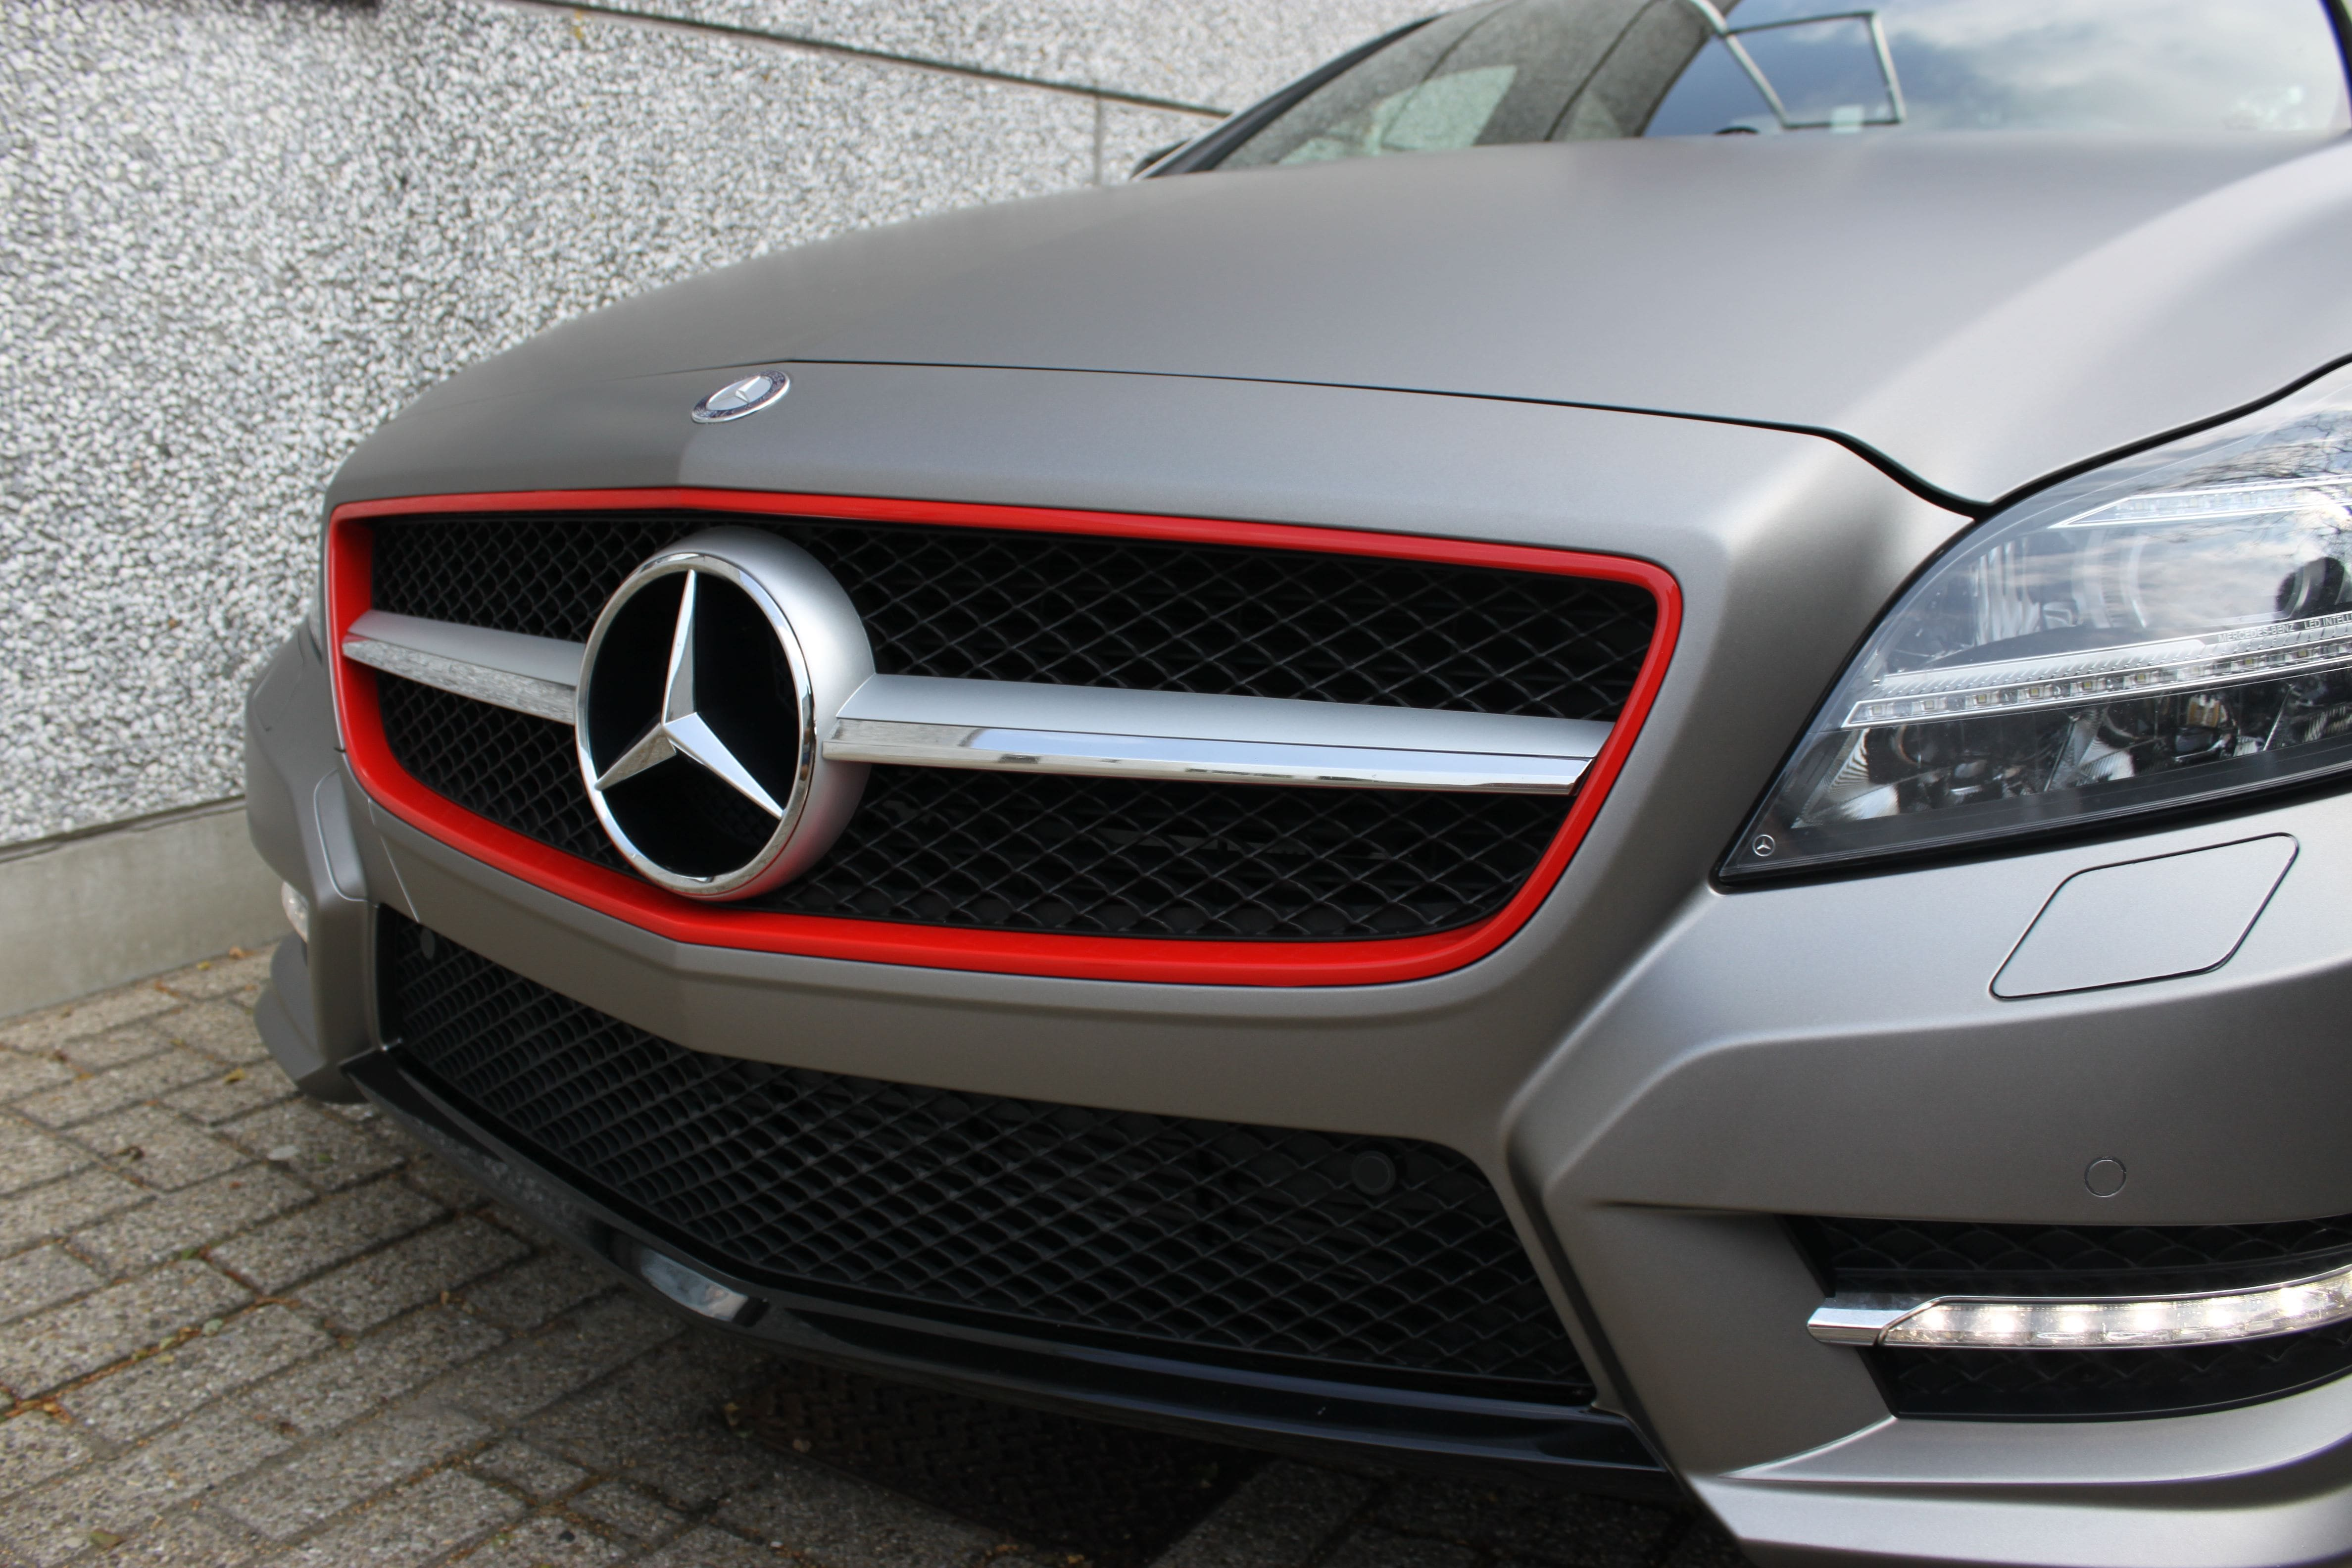 Mercedes CLS met Mat Grey Aluminium Wrap, Carwrapping door Wrapmyride.nu Foto-nr:6145, ©2020